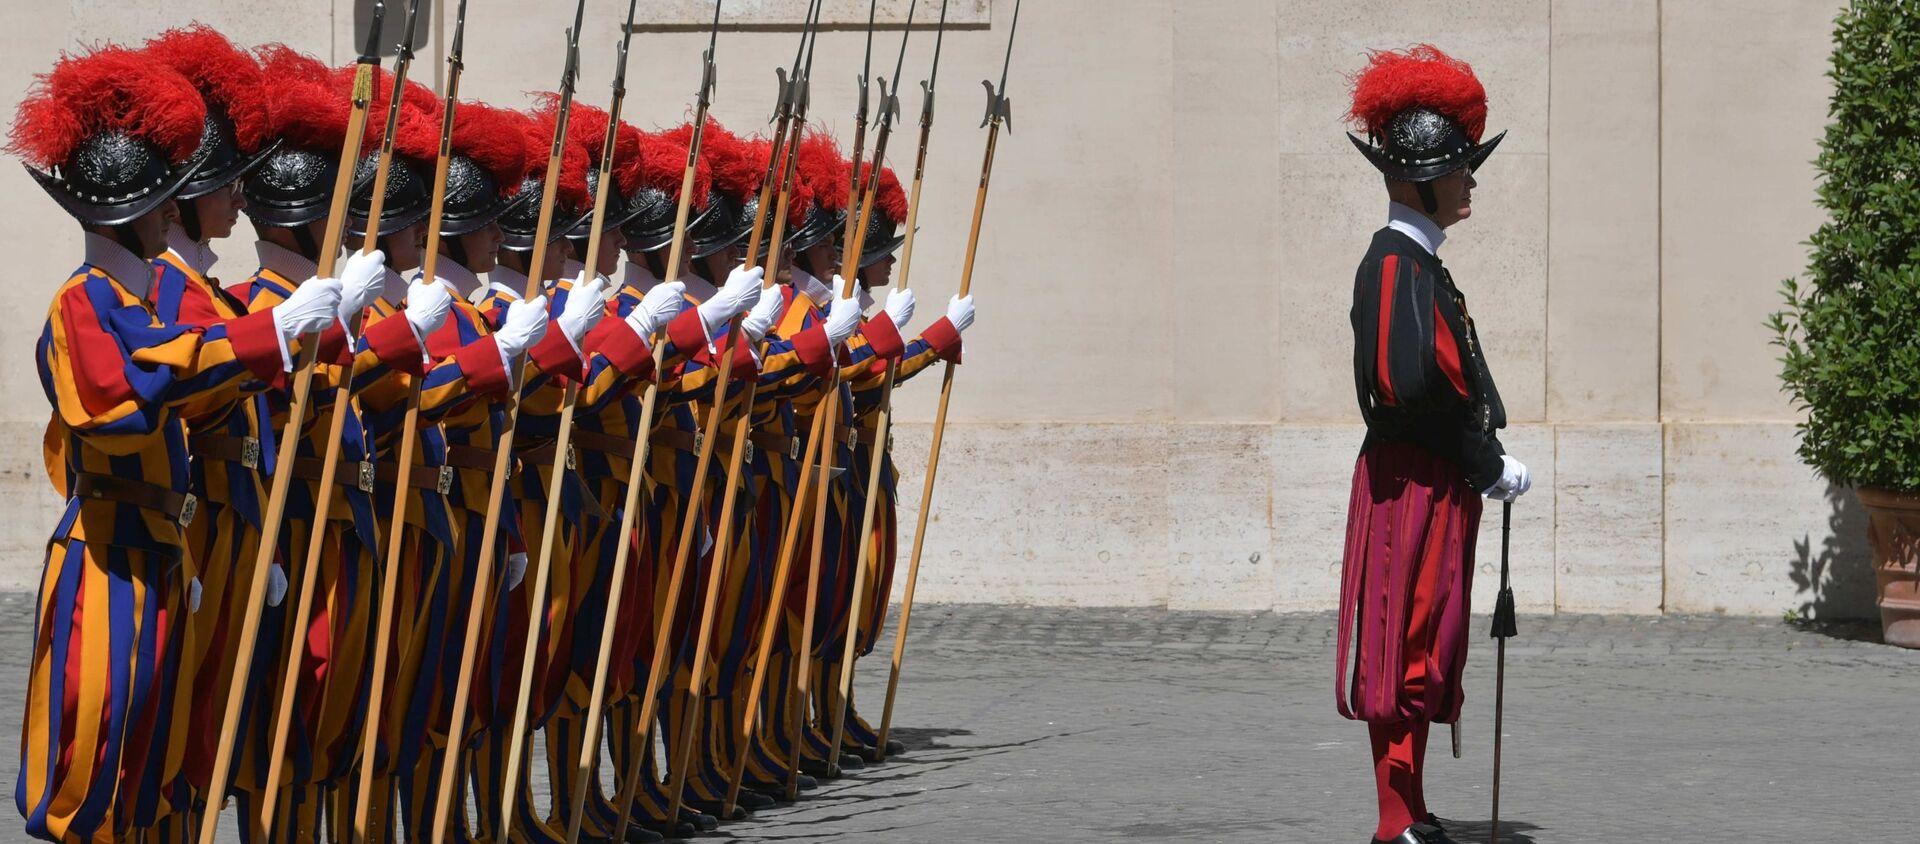 La Guardia svizzera pontificia  - Sputnik Italia, 1920, 18.02.2021